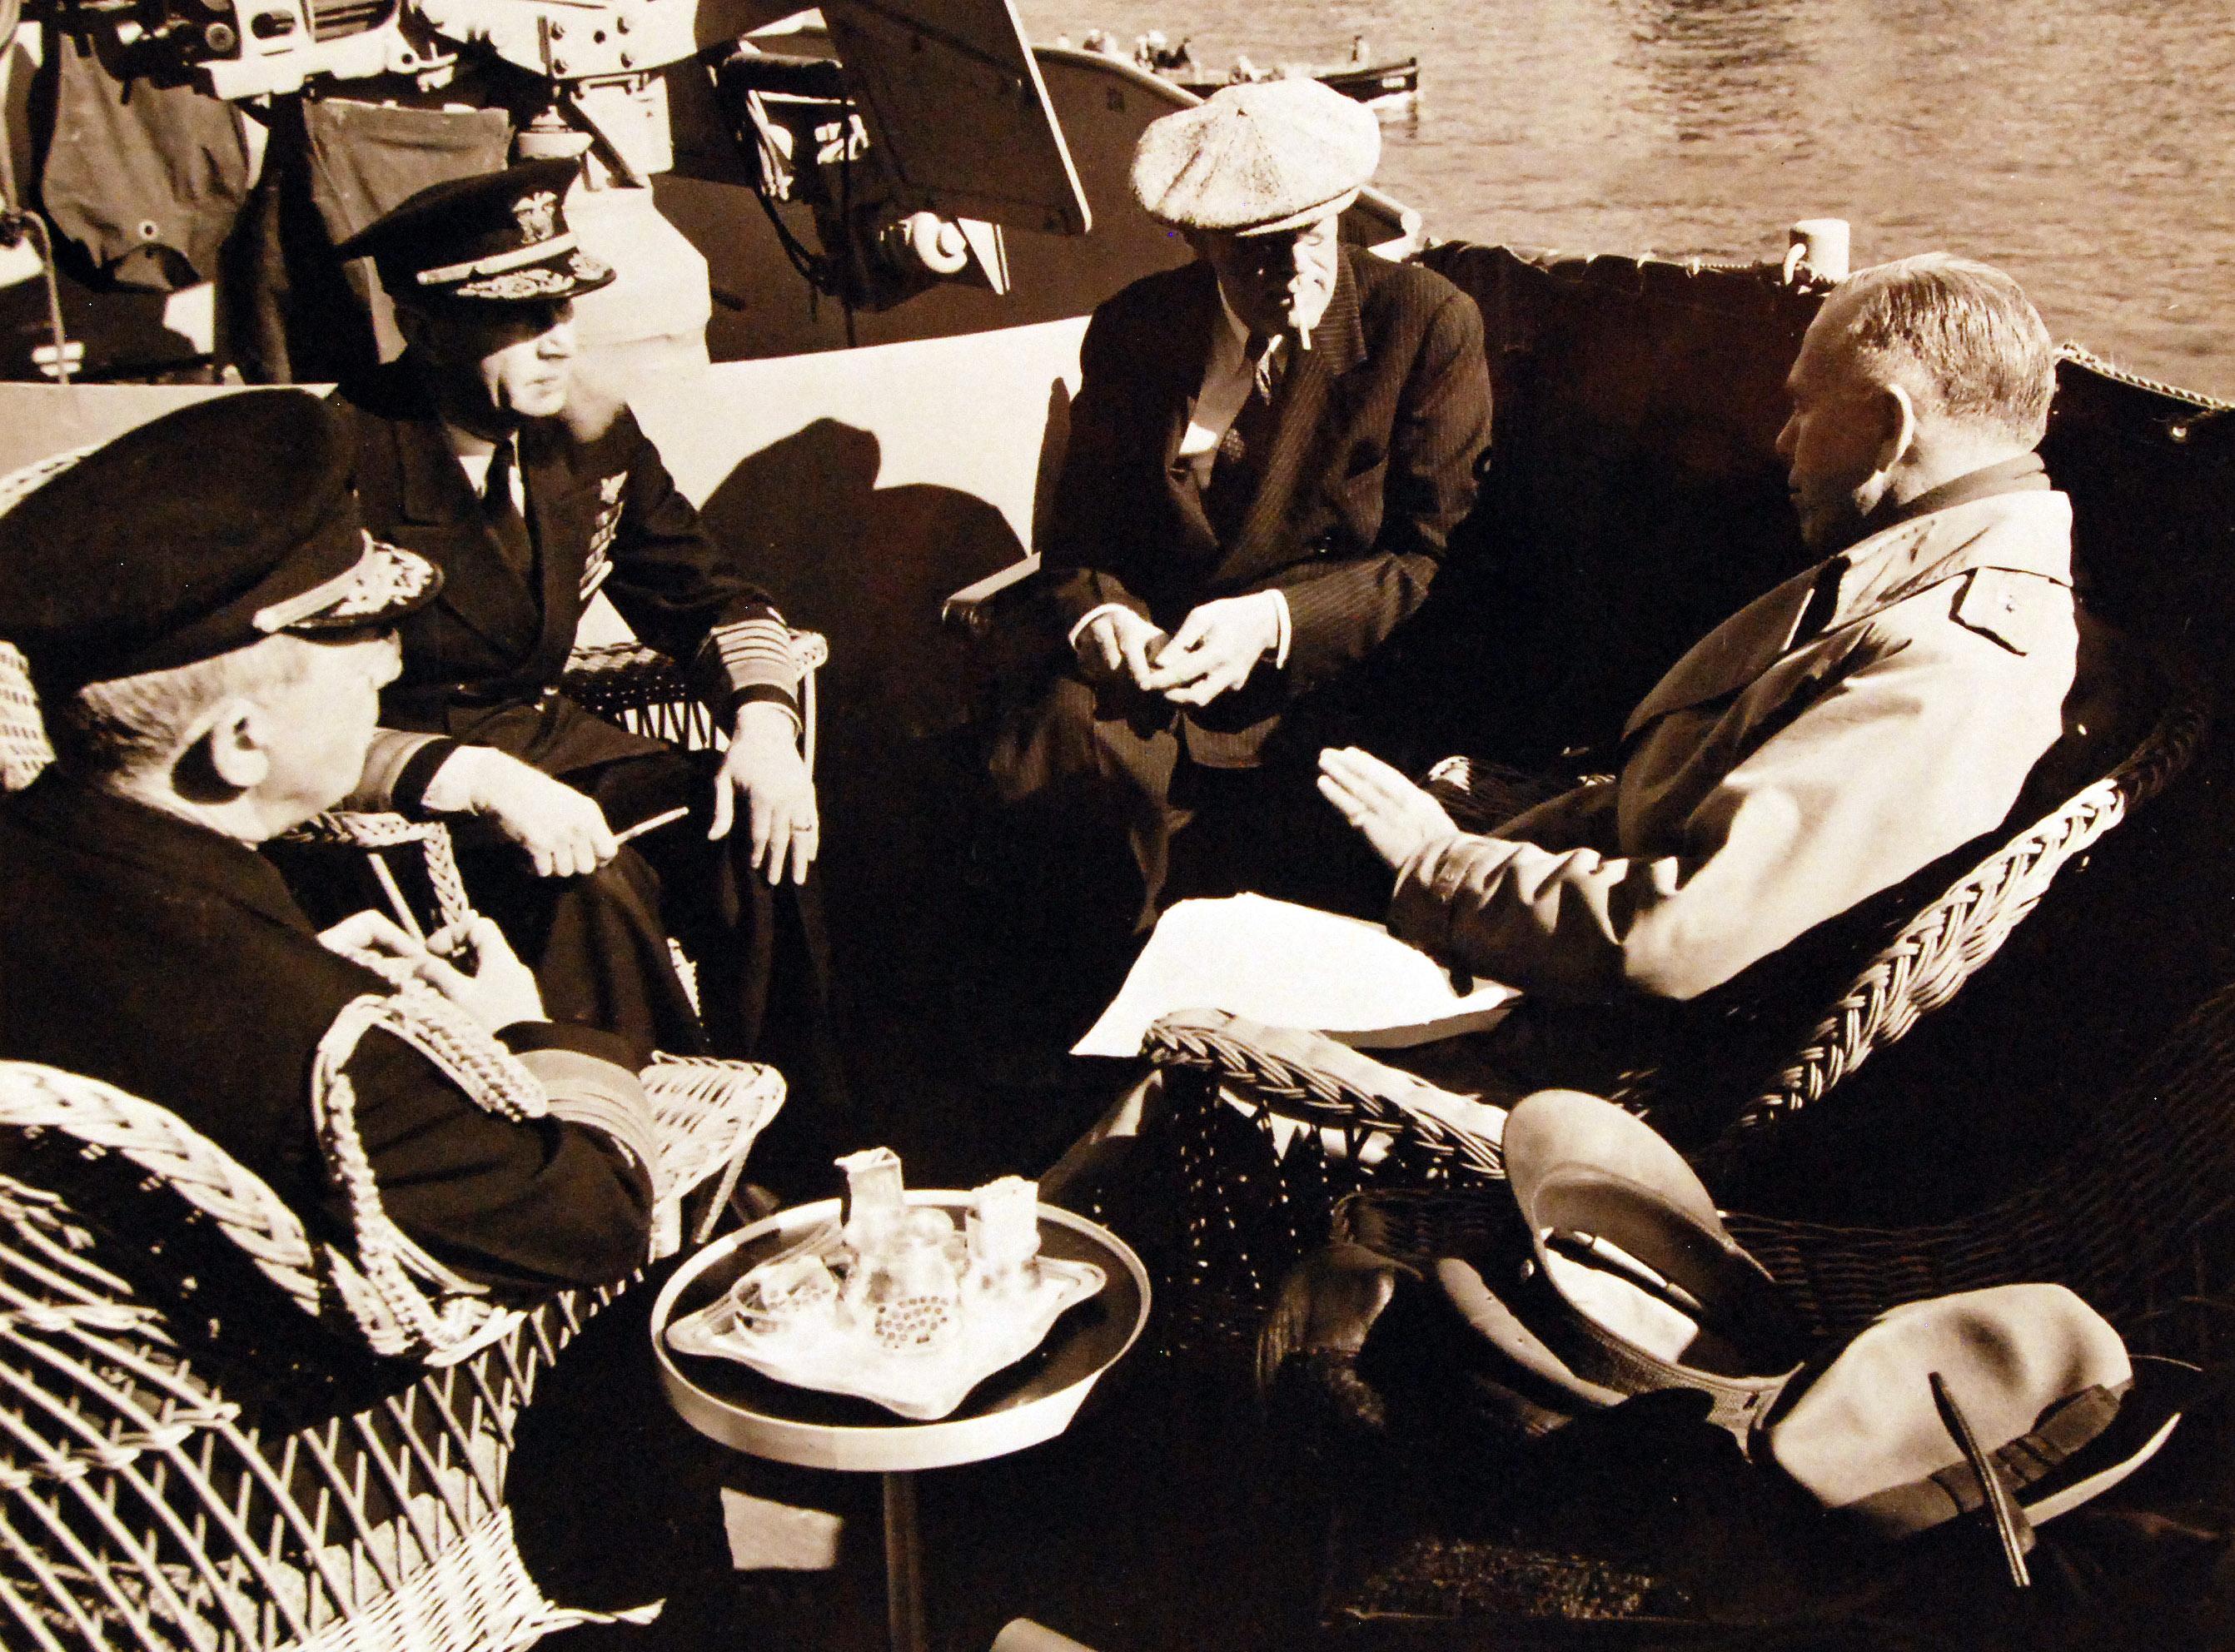 Адмирал флота Уильям Д.Леги, адмирал флота Военно-морских сил США Эрнест Дж. Кинг; Президент Франклин Д. Рузвельт и генерал Джордж Маршалл